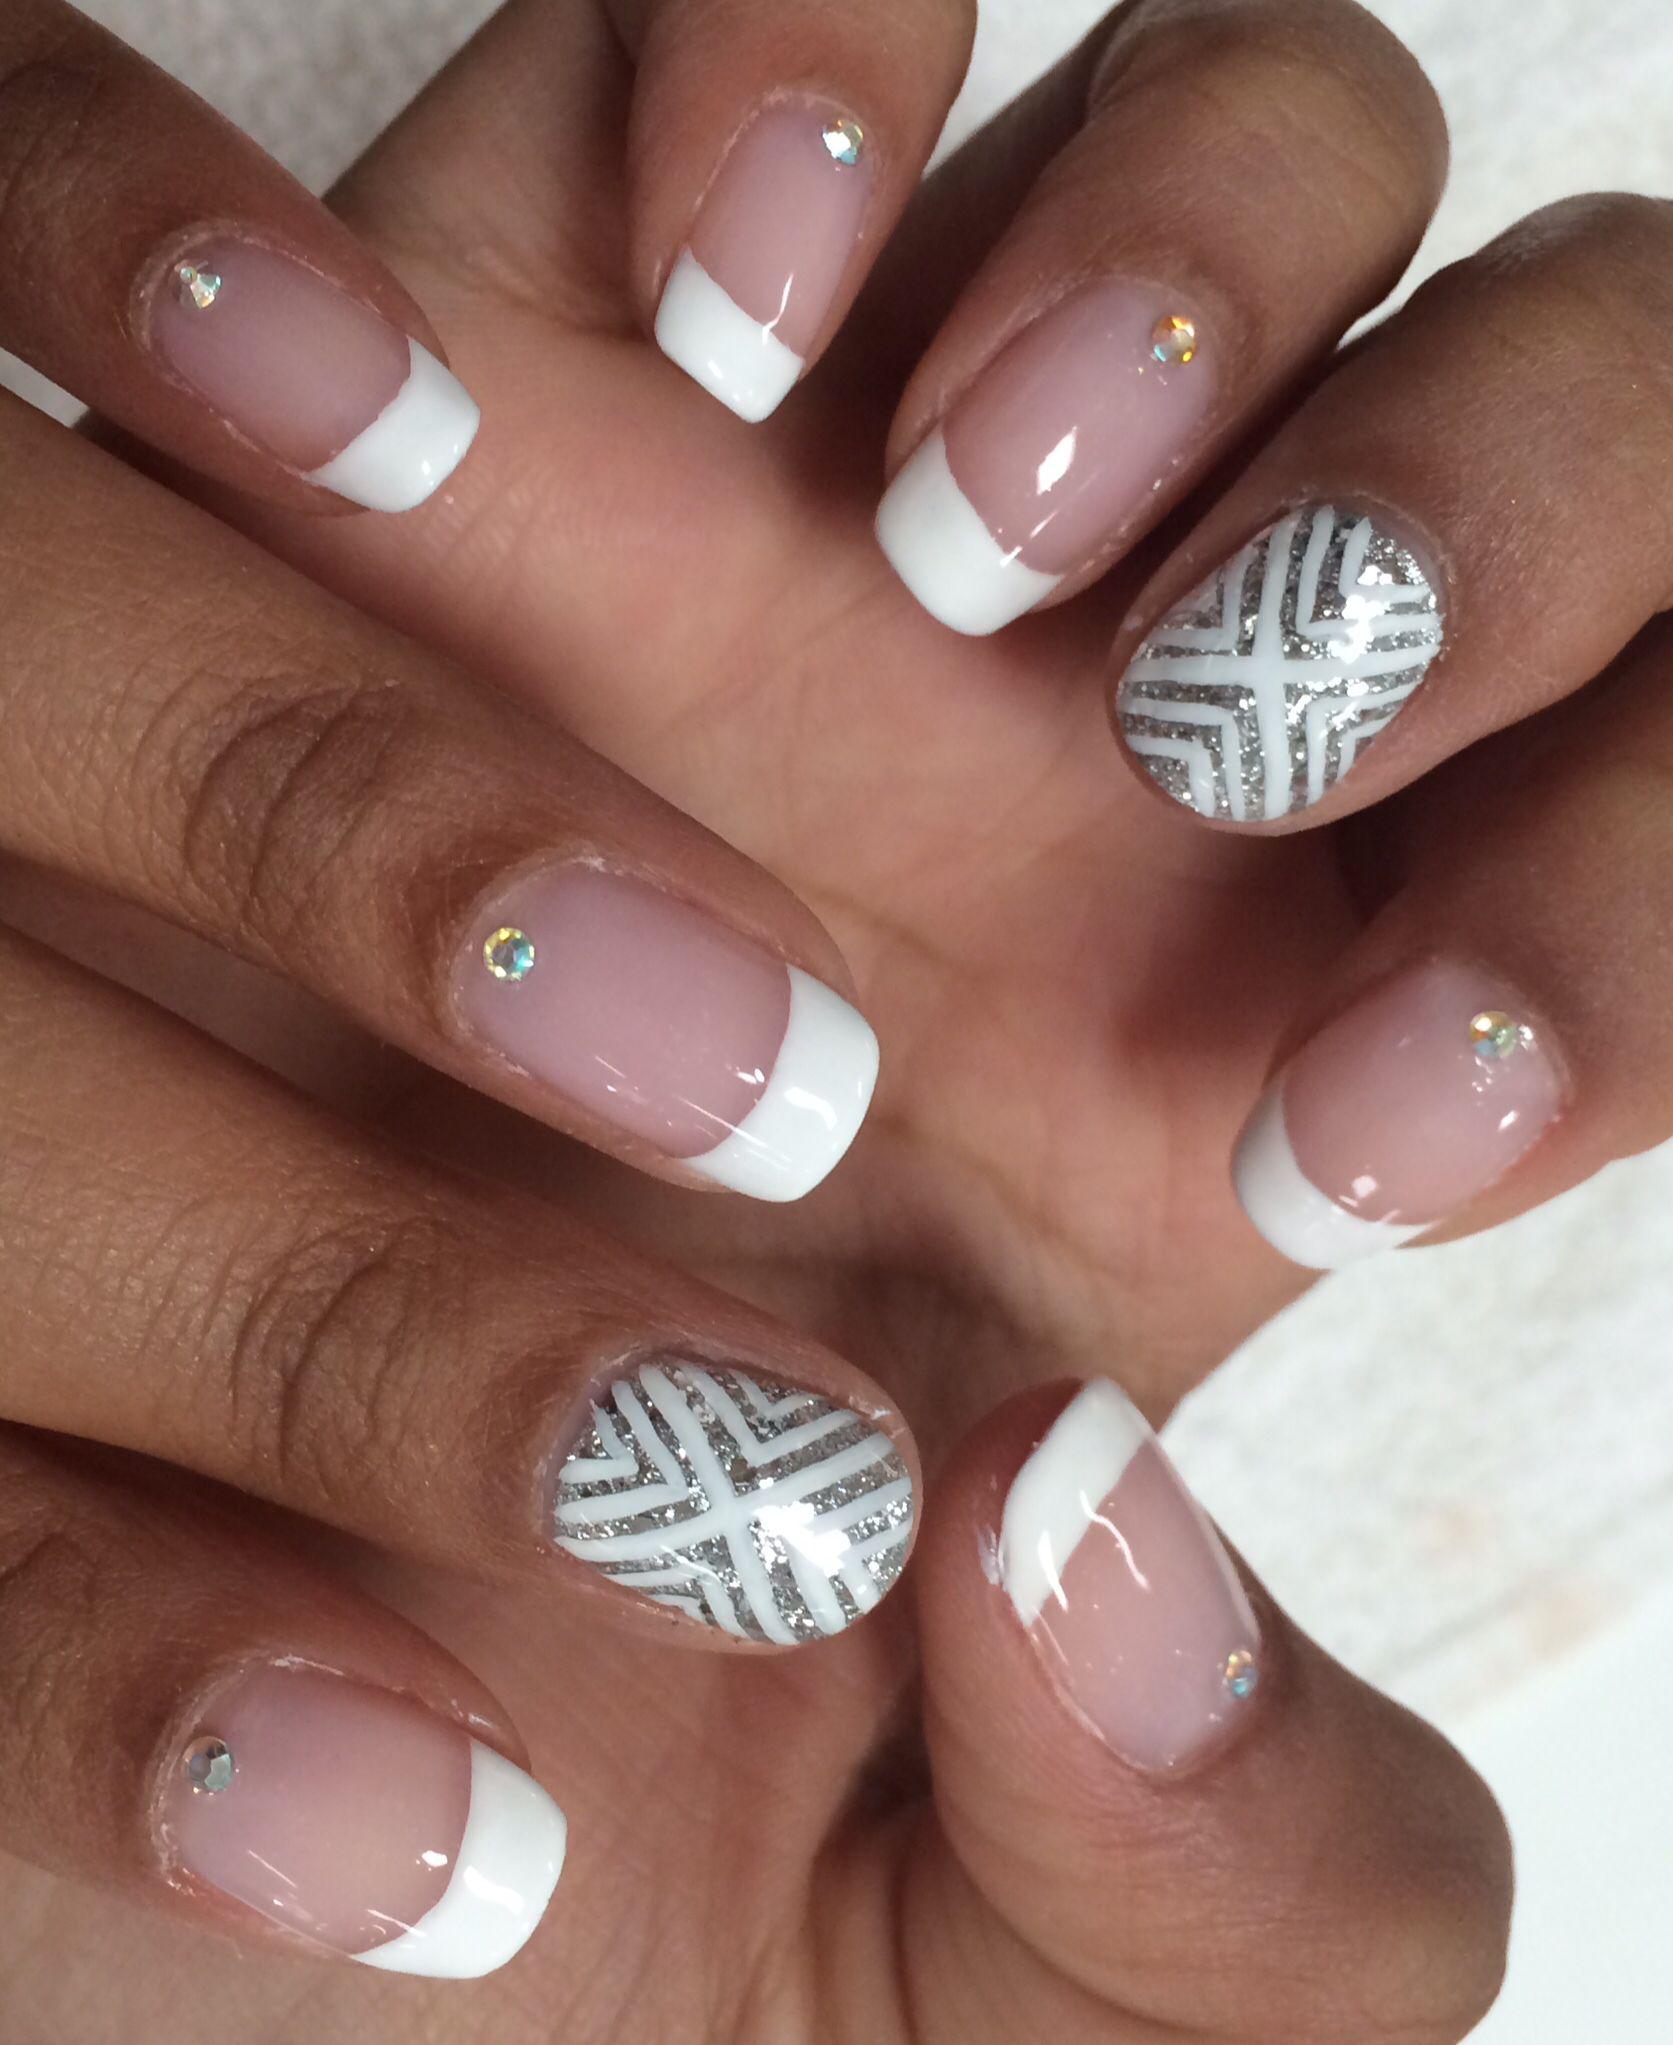 White French Mani with Rhinestones Silver Nail Art Summer 2014 Nail ...